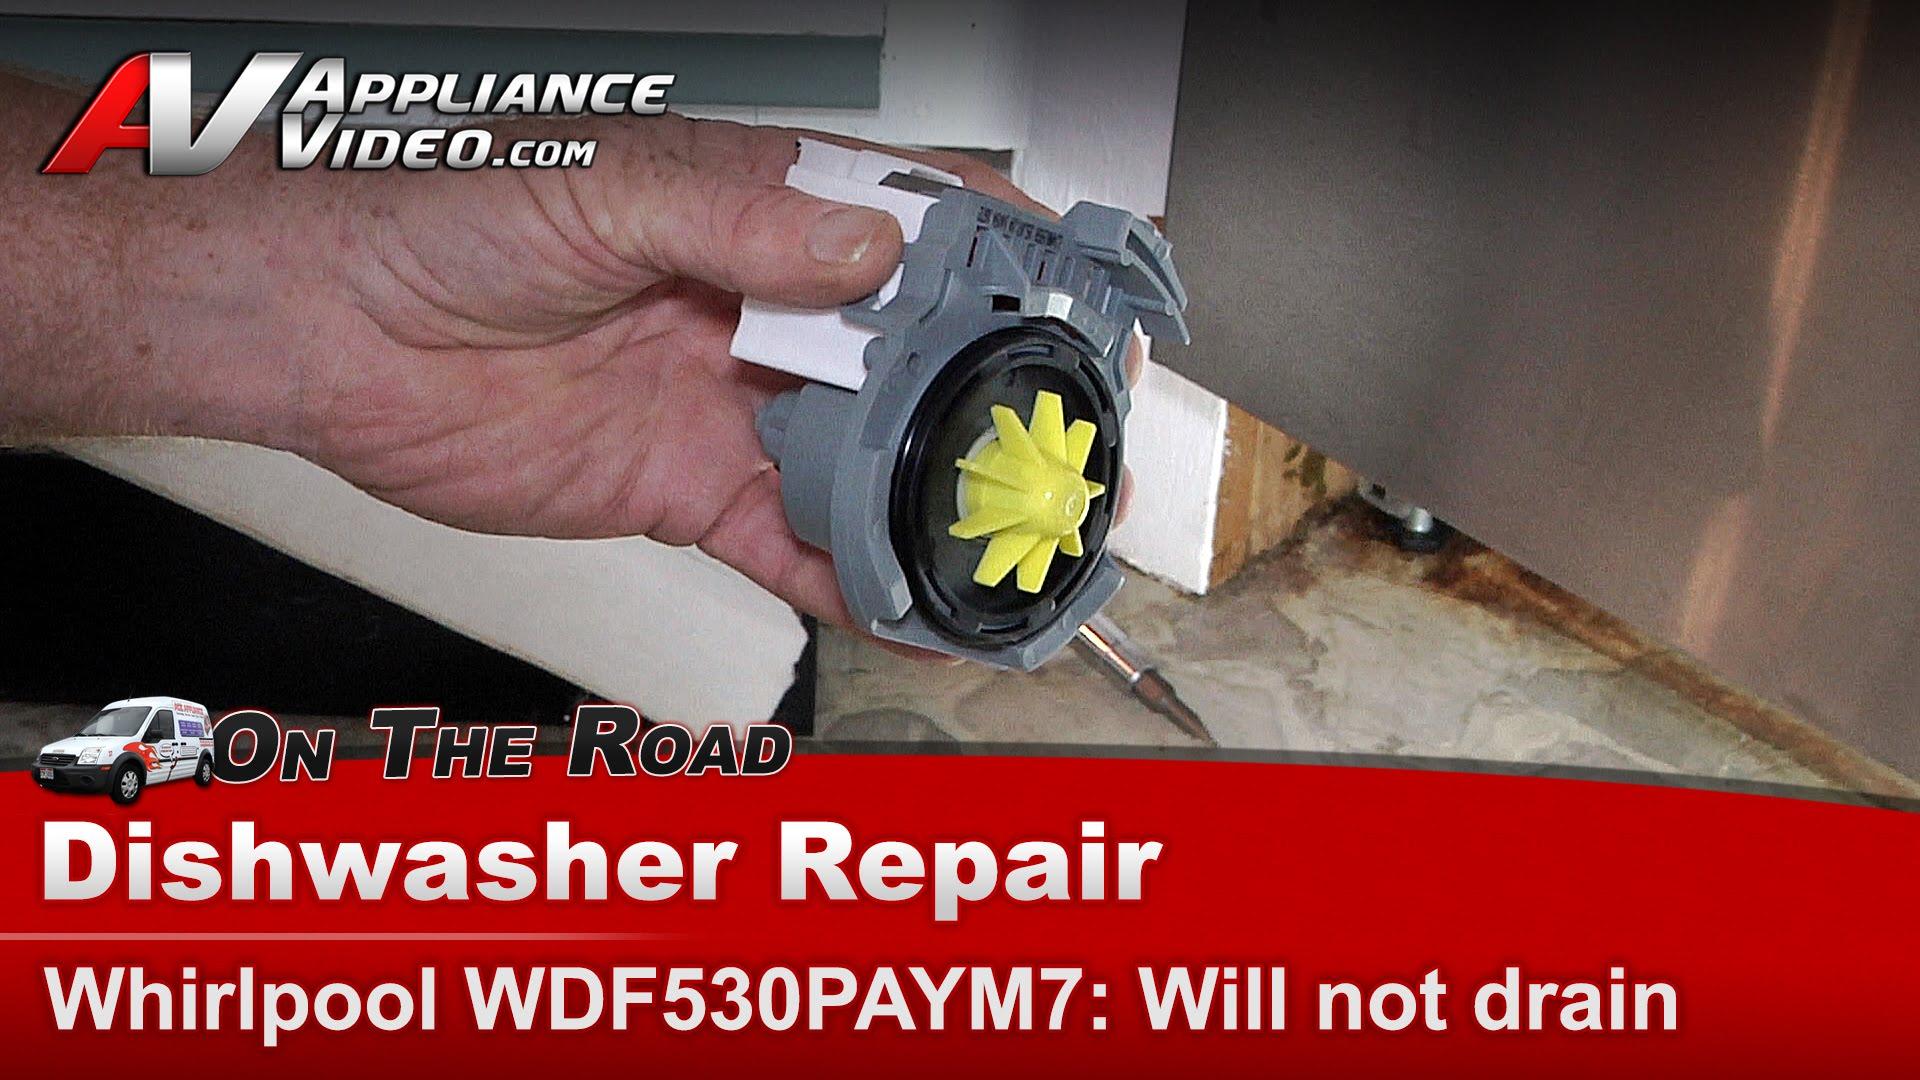 Whirlpool Wdf530paym7 Dishwasher Repair Not Draining